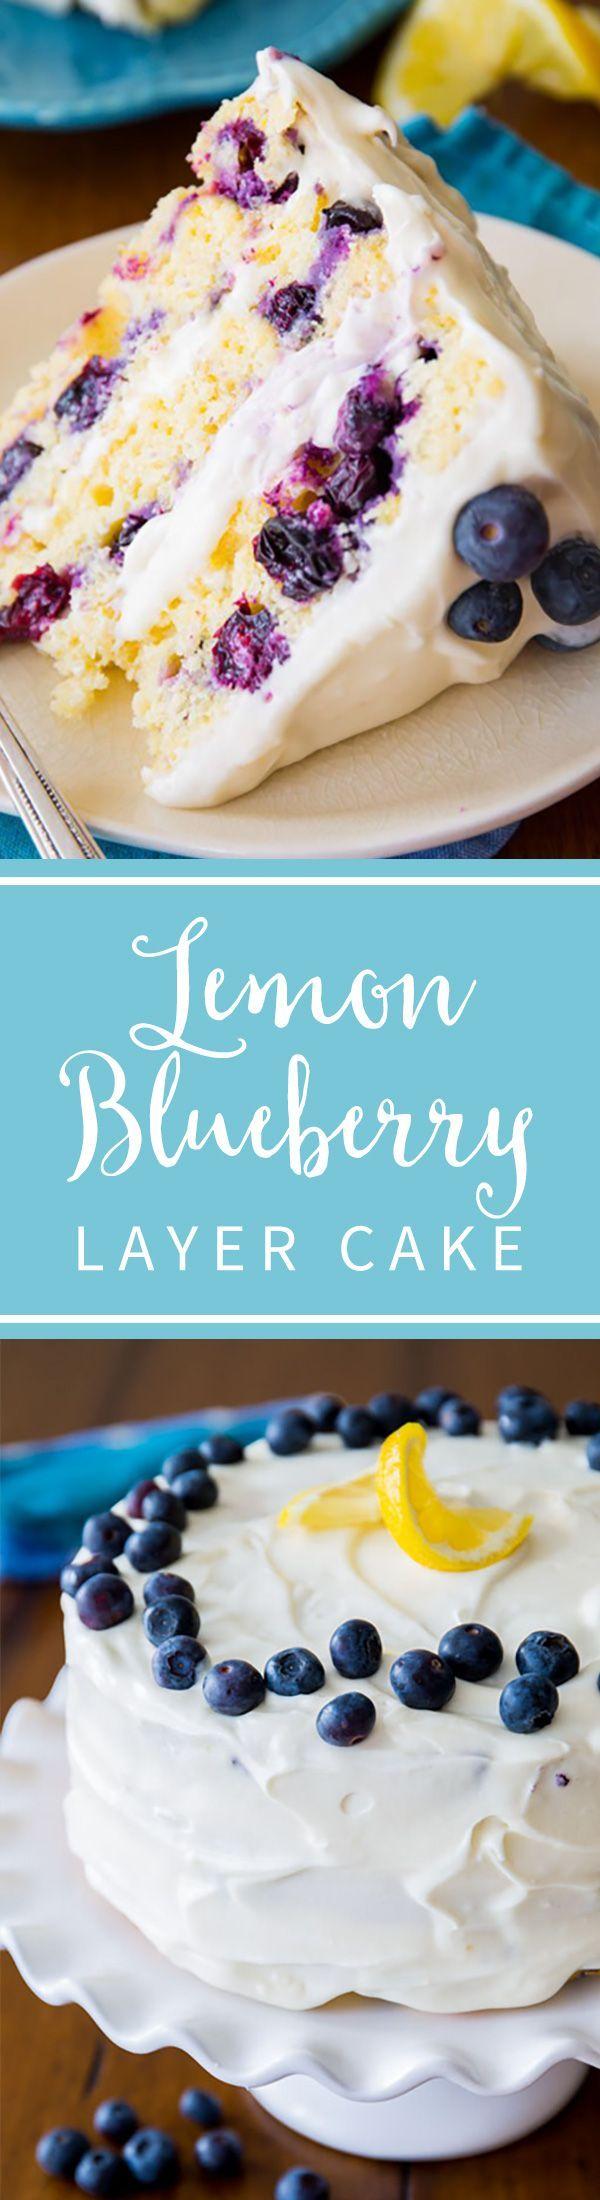 The best lemon cake! Lemon blueberry layer cake is delicious, easy, moist, and perfect for spring and summer dessert! Recipe on sallysbakingaddiction.com